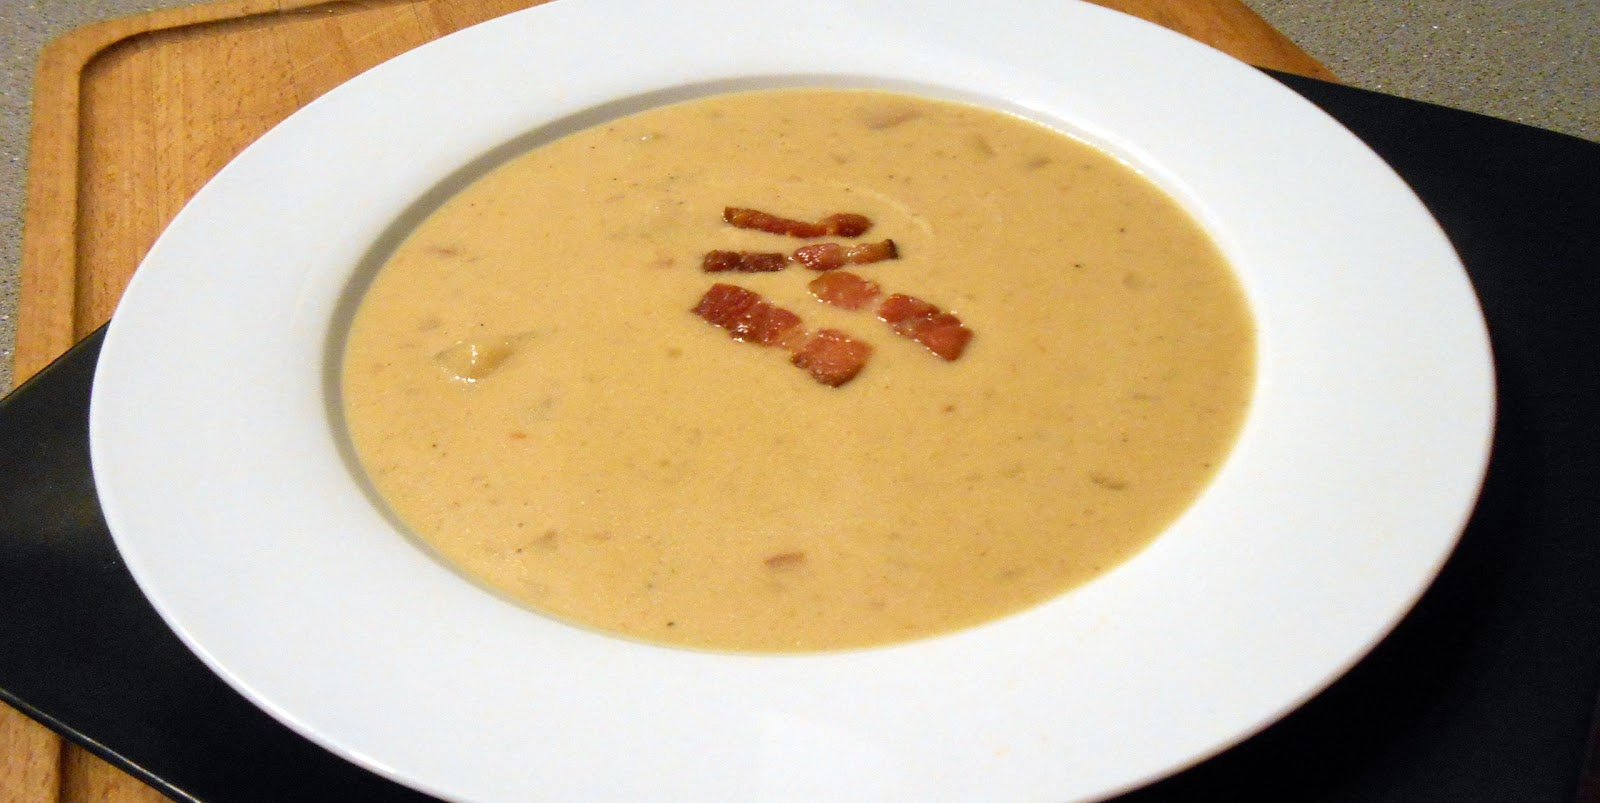 Soup tuesday kartoffelsuppe german potato soup kartoffelsuppe german potato soup publicscrutiny Images